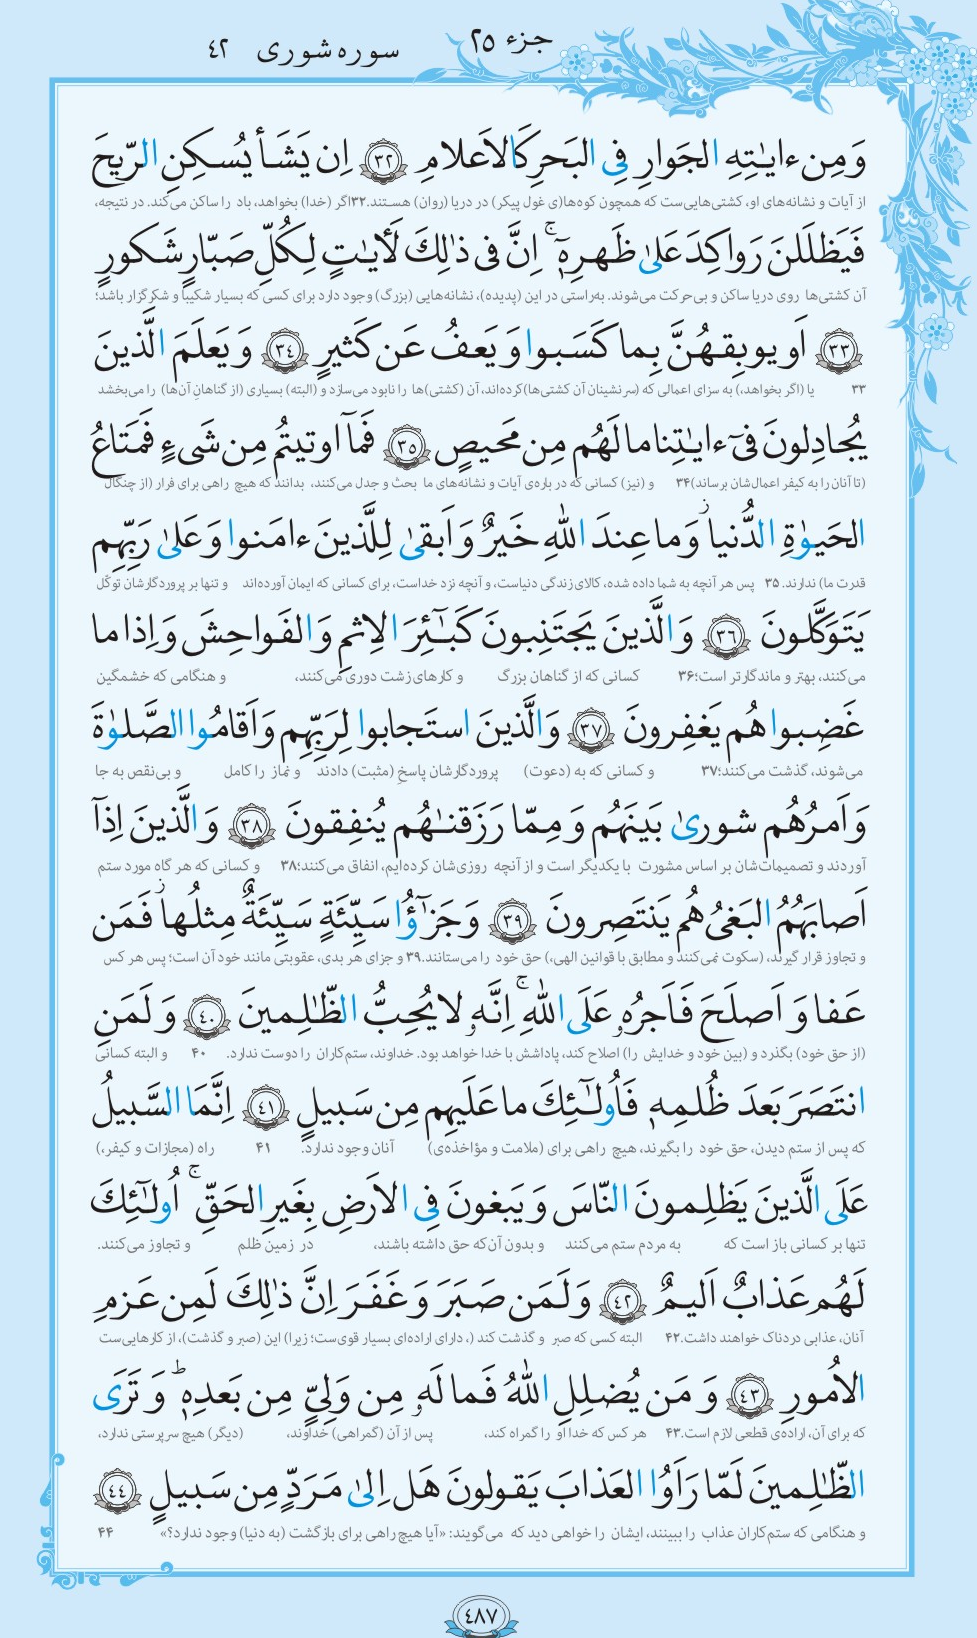 13990626000851 Test NewPhotoFree - ترتیل صفحه ۴۸۷ قرآن کریم+فیلم و متن آیات